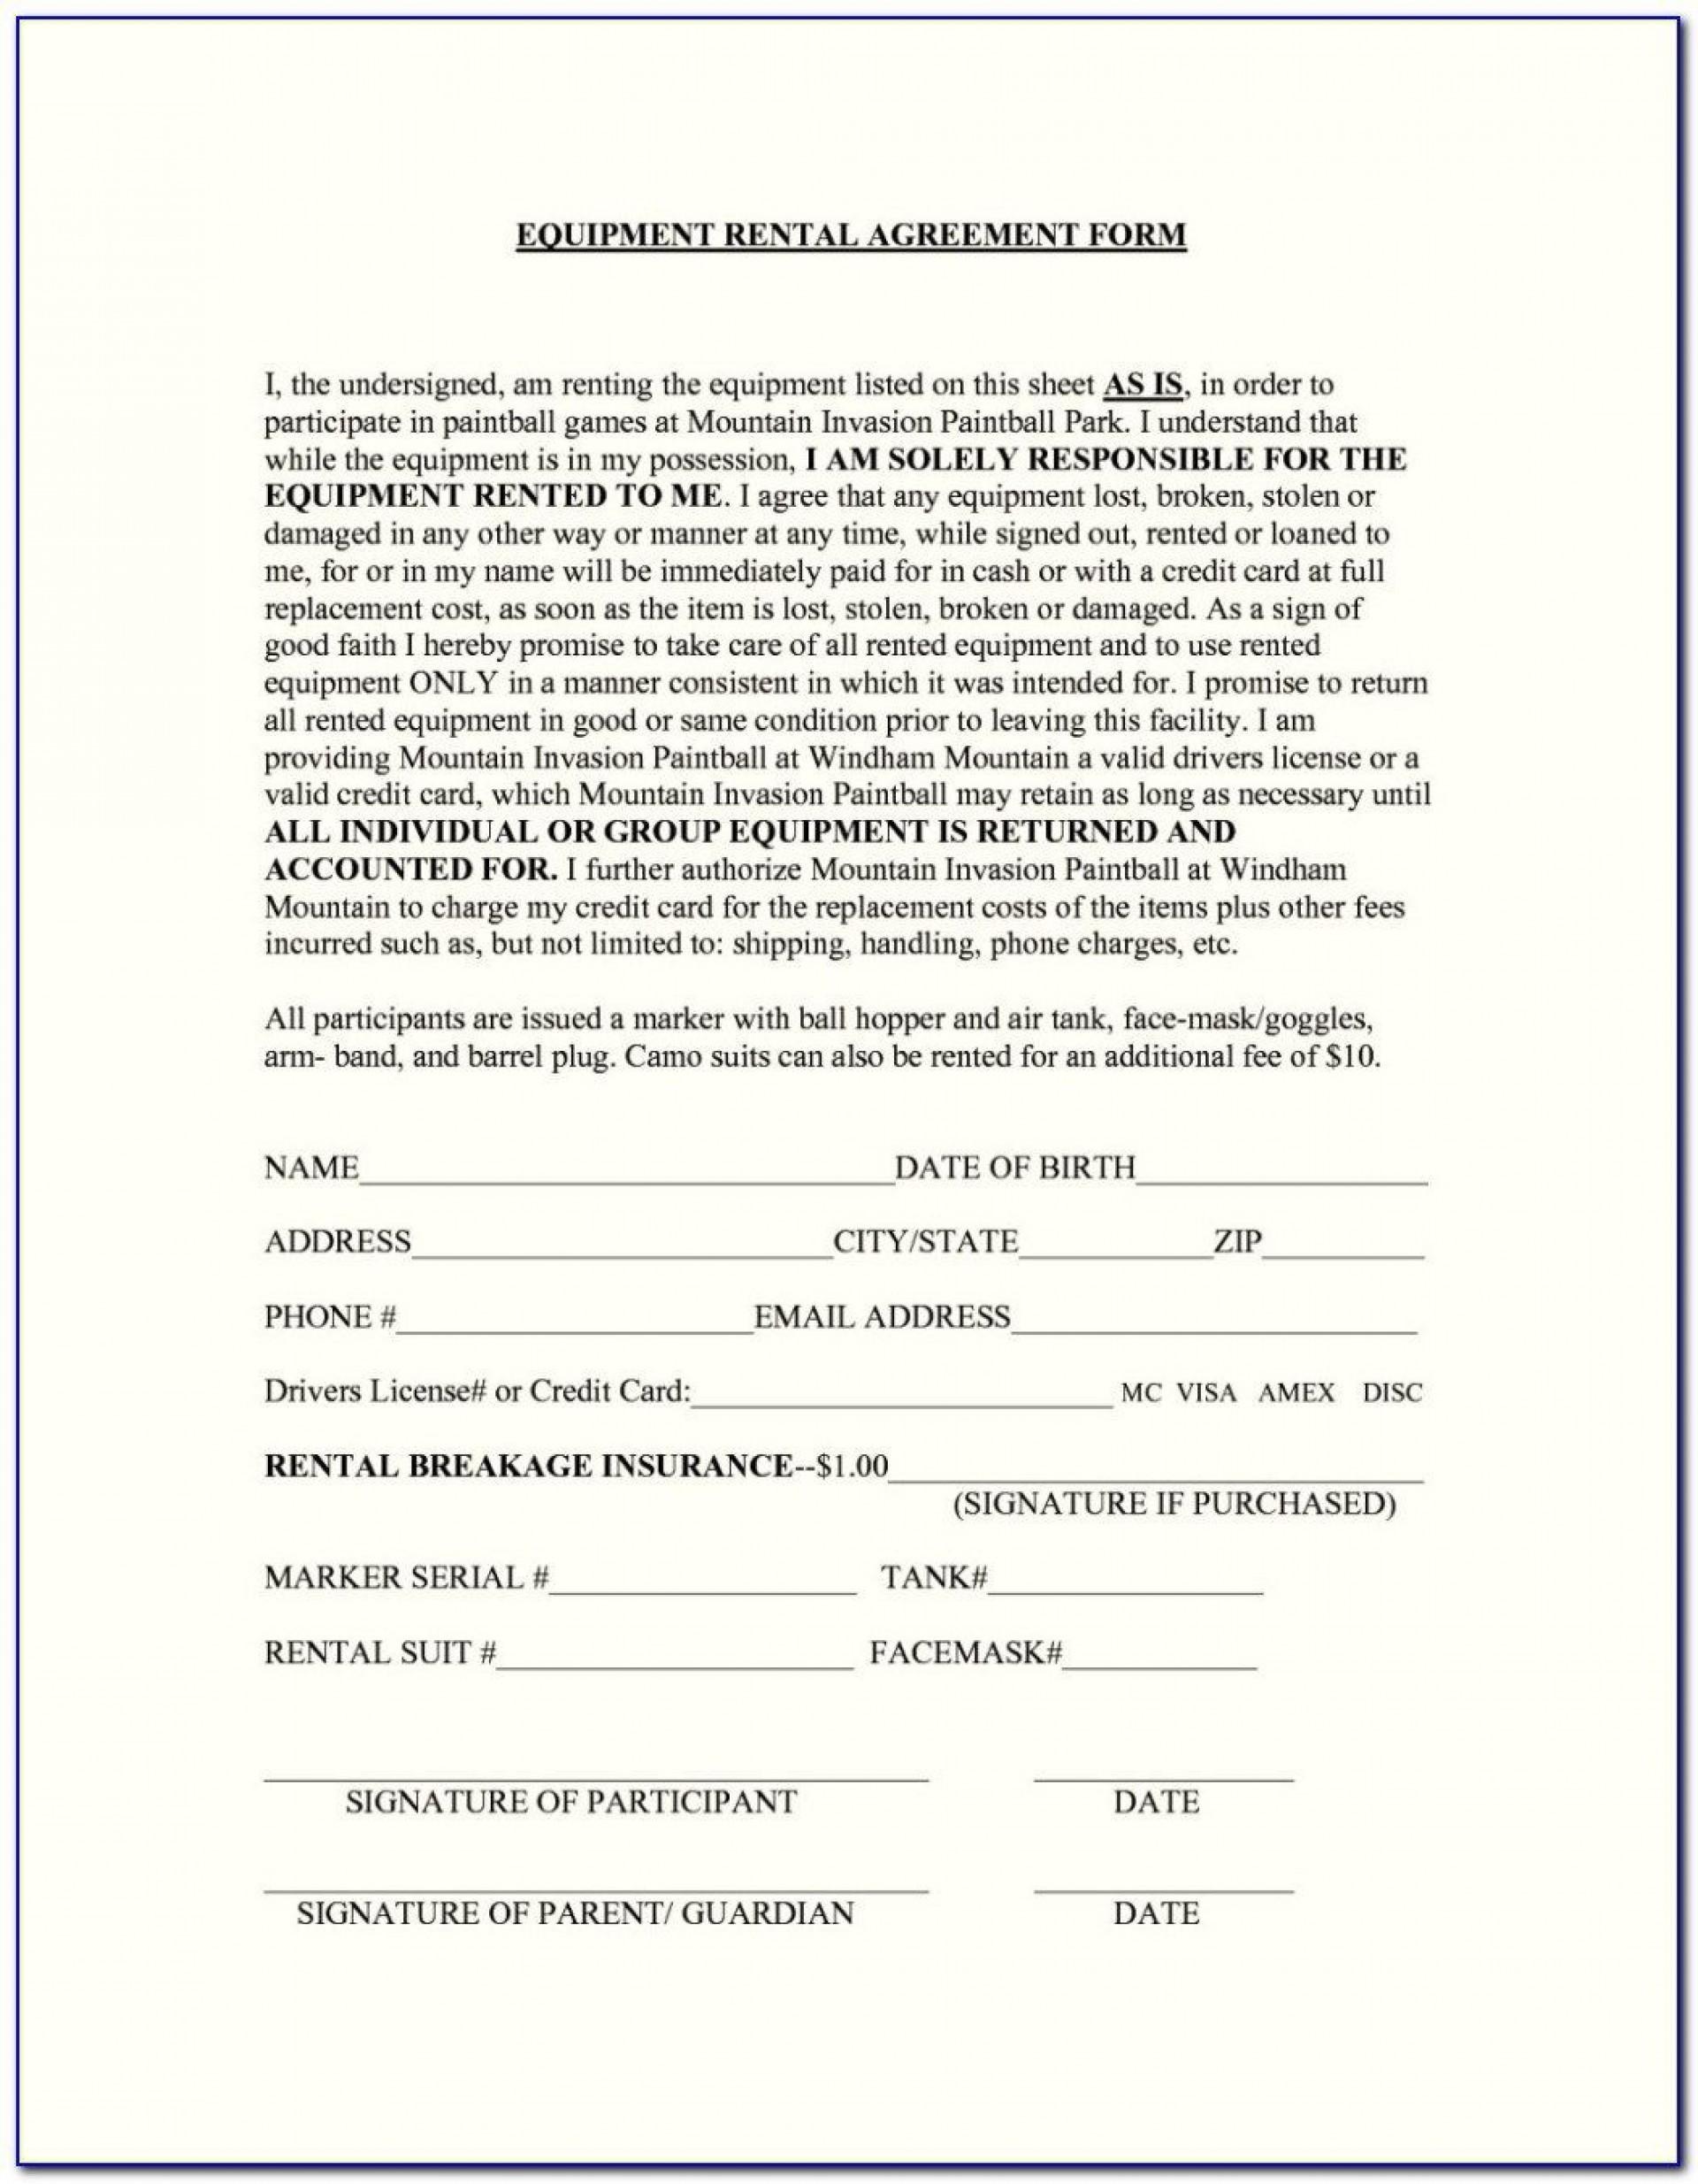 004 Astounding Rental Agreement Template Word Canada High Def 1920